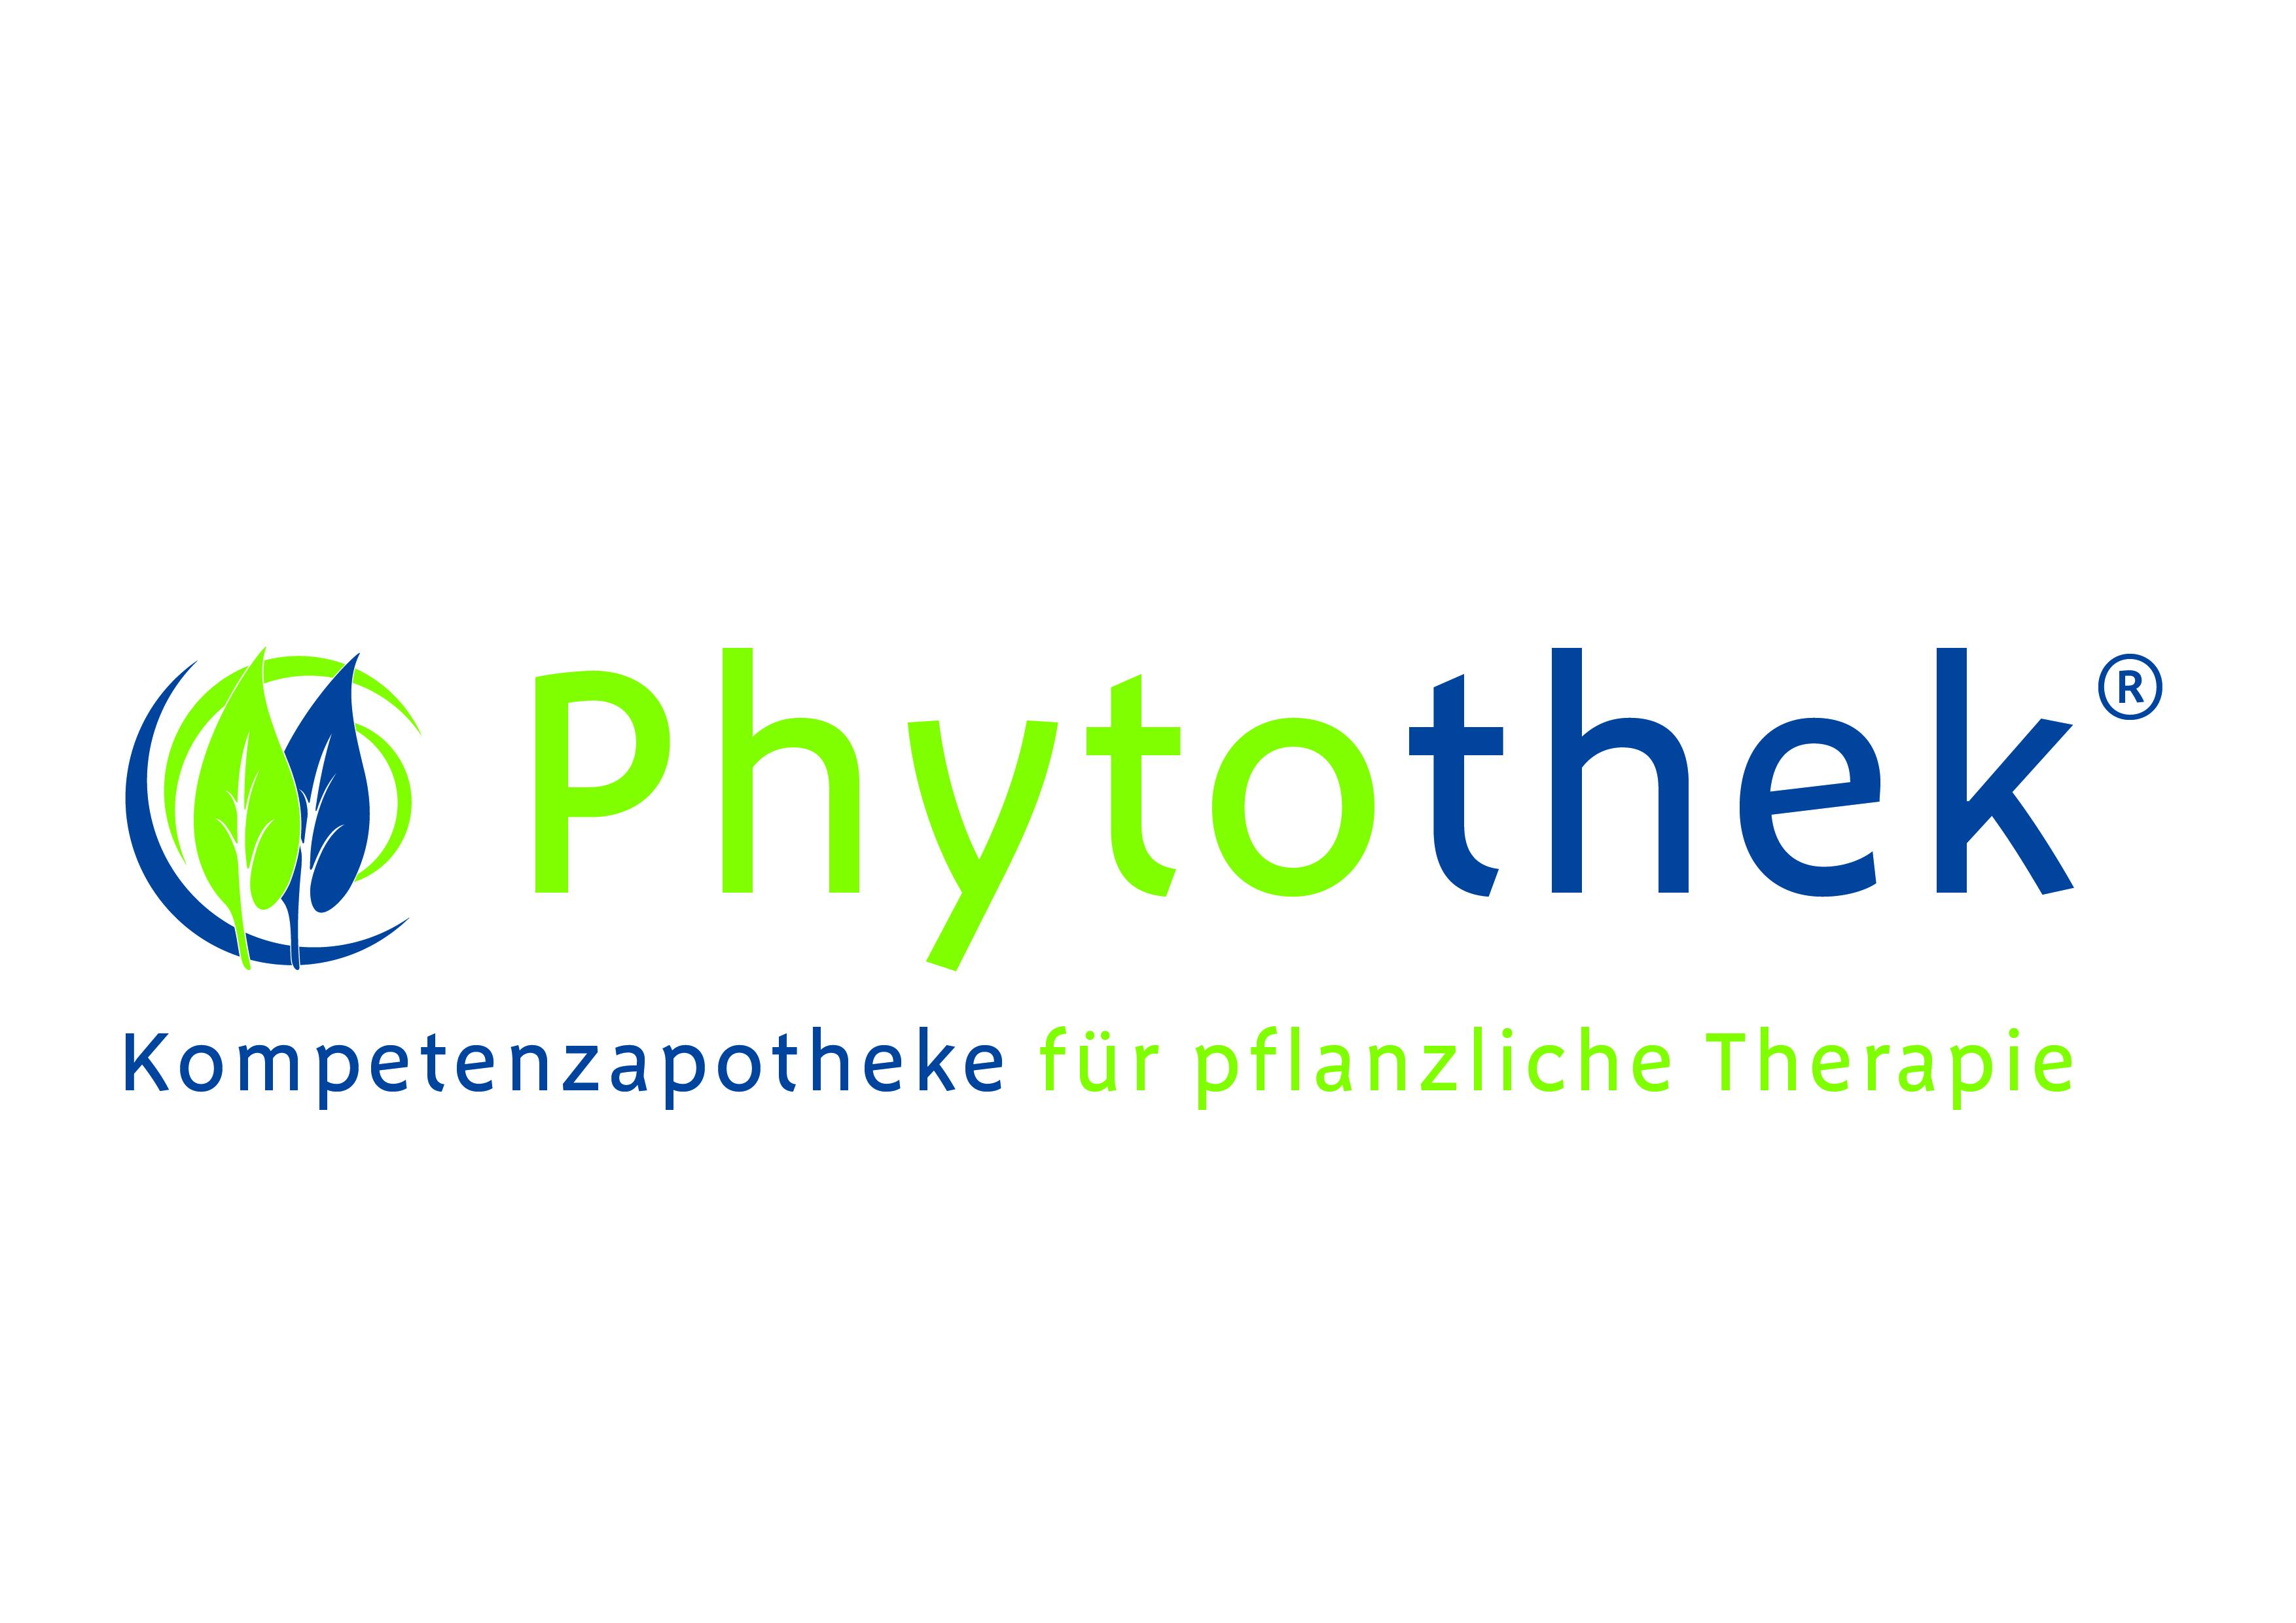 Phytothek / Telepharmazie Bild 2